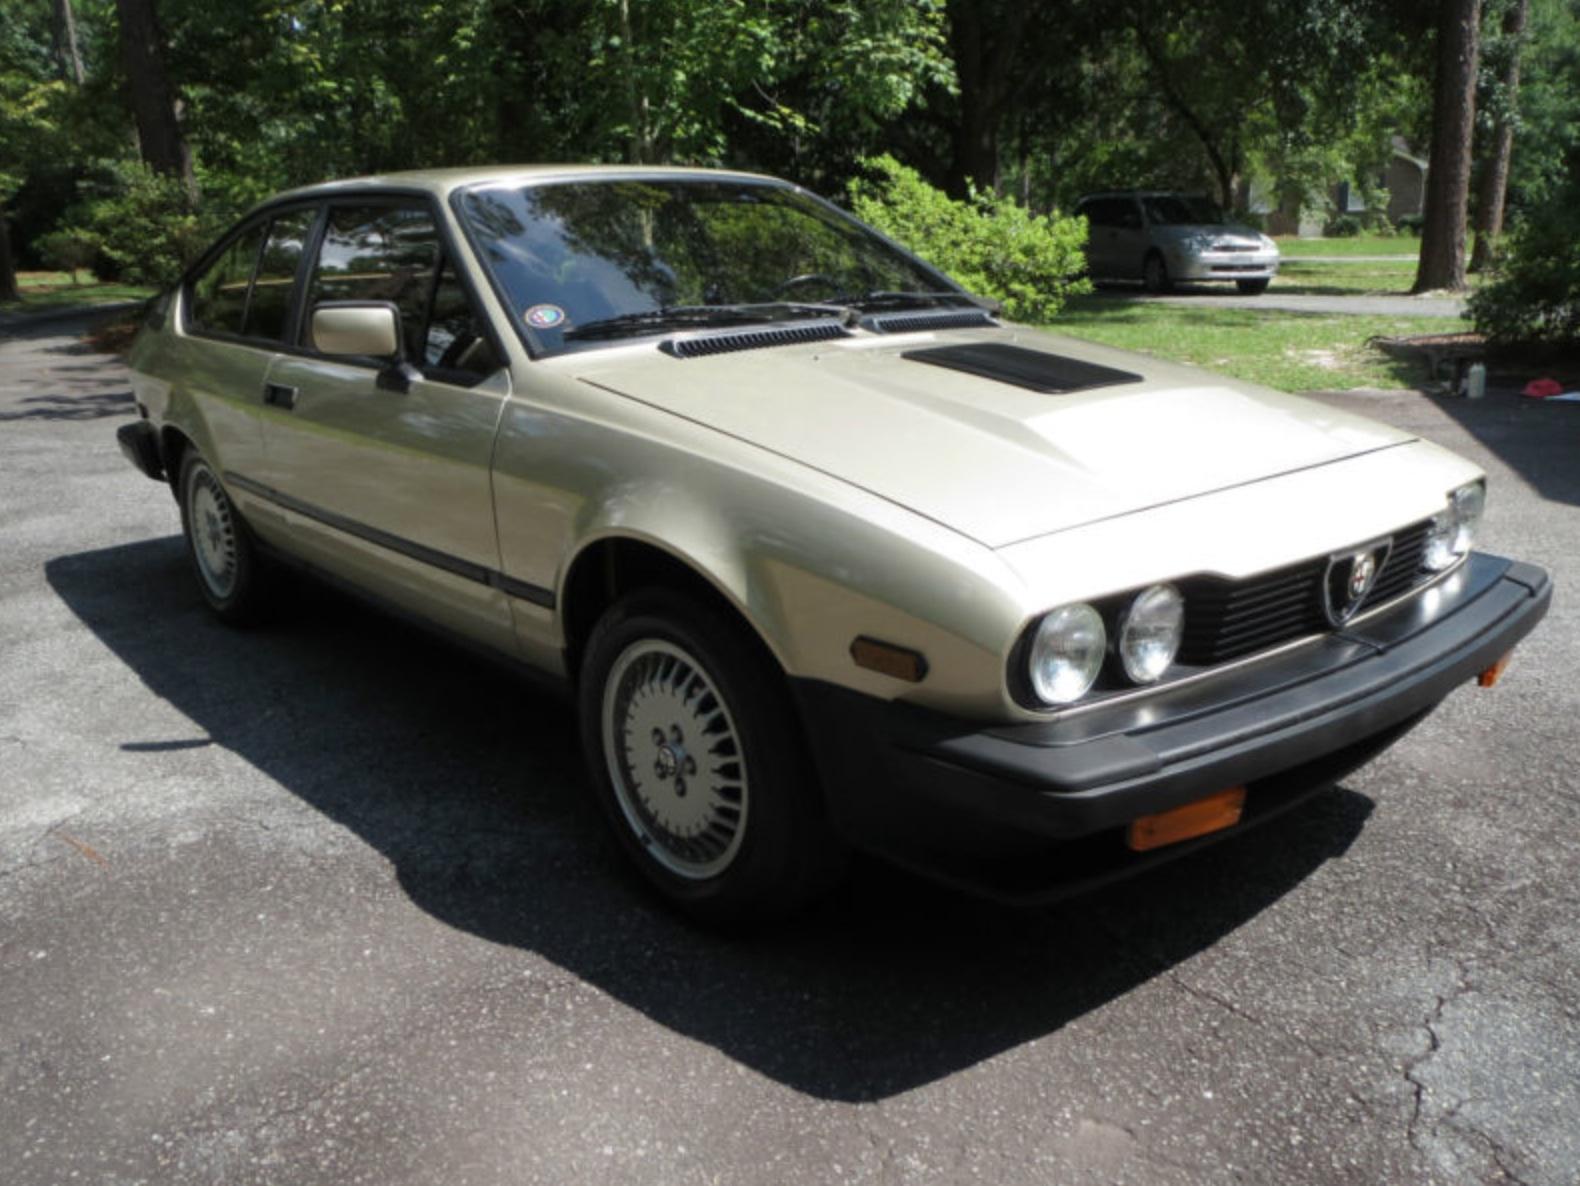 1986 alfa romeo gtv6 revisit classic italian cars for sale. Black Bedroom Furniture Sets. Home Design Ideas